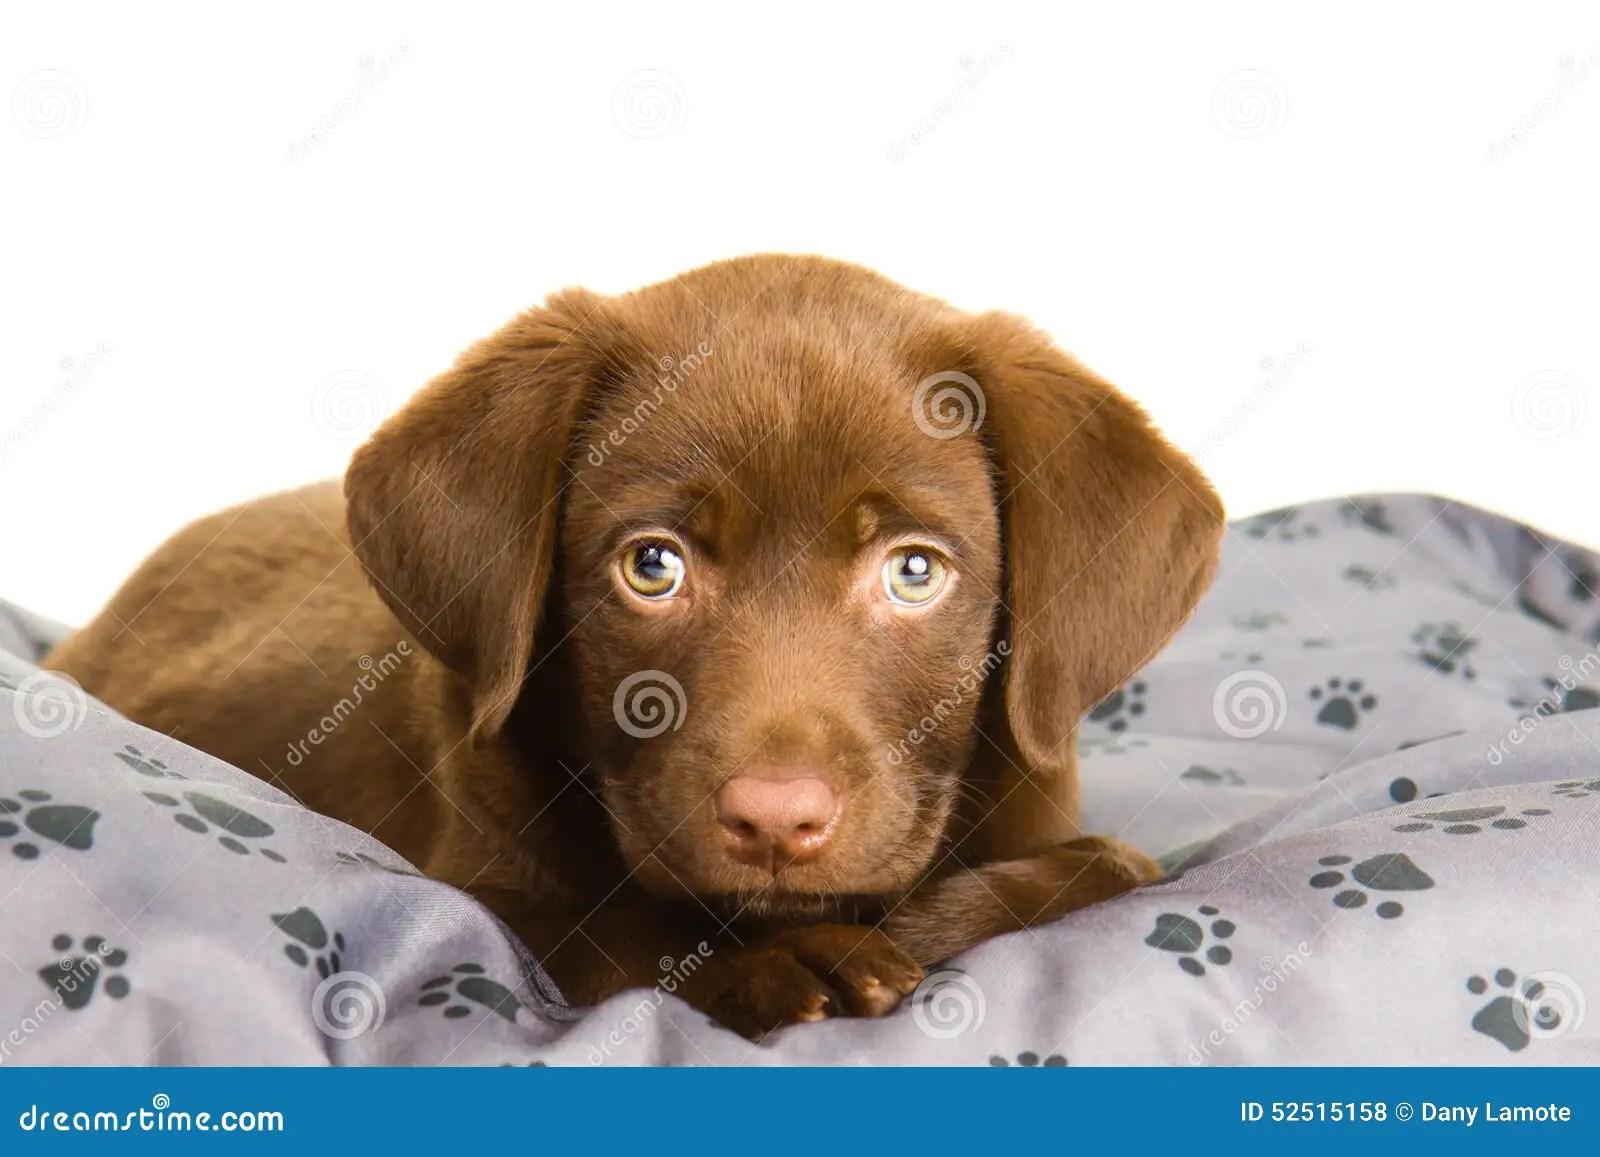 Cute Paw Print Wallpaper Cute Chocolate Brown Labrador Puppy Dog On A Grey Pillow